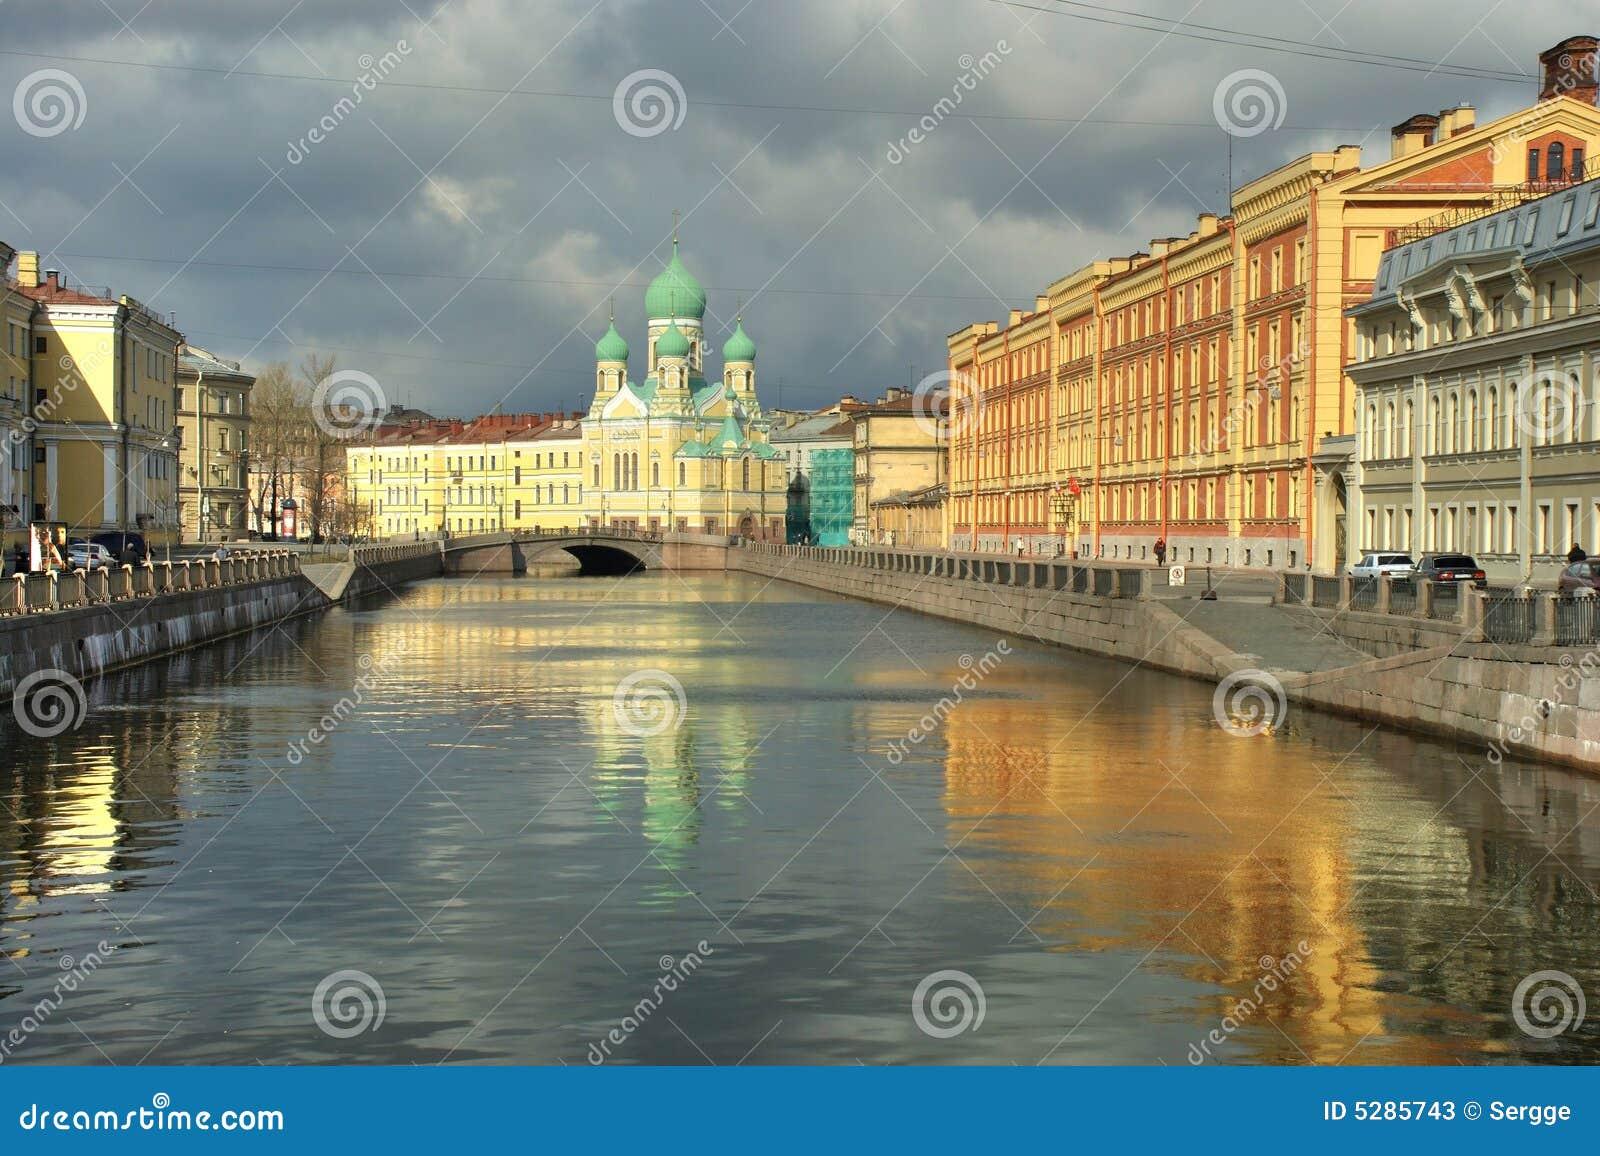 Griboedov channel Petersburg